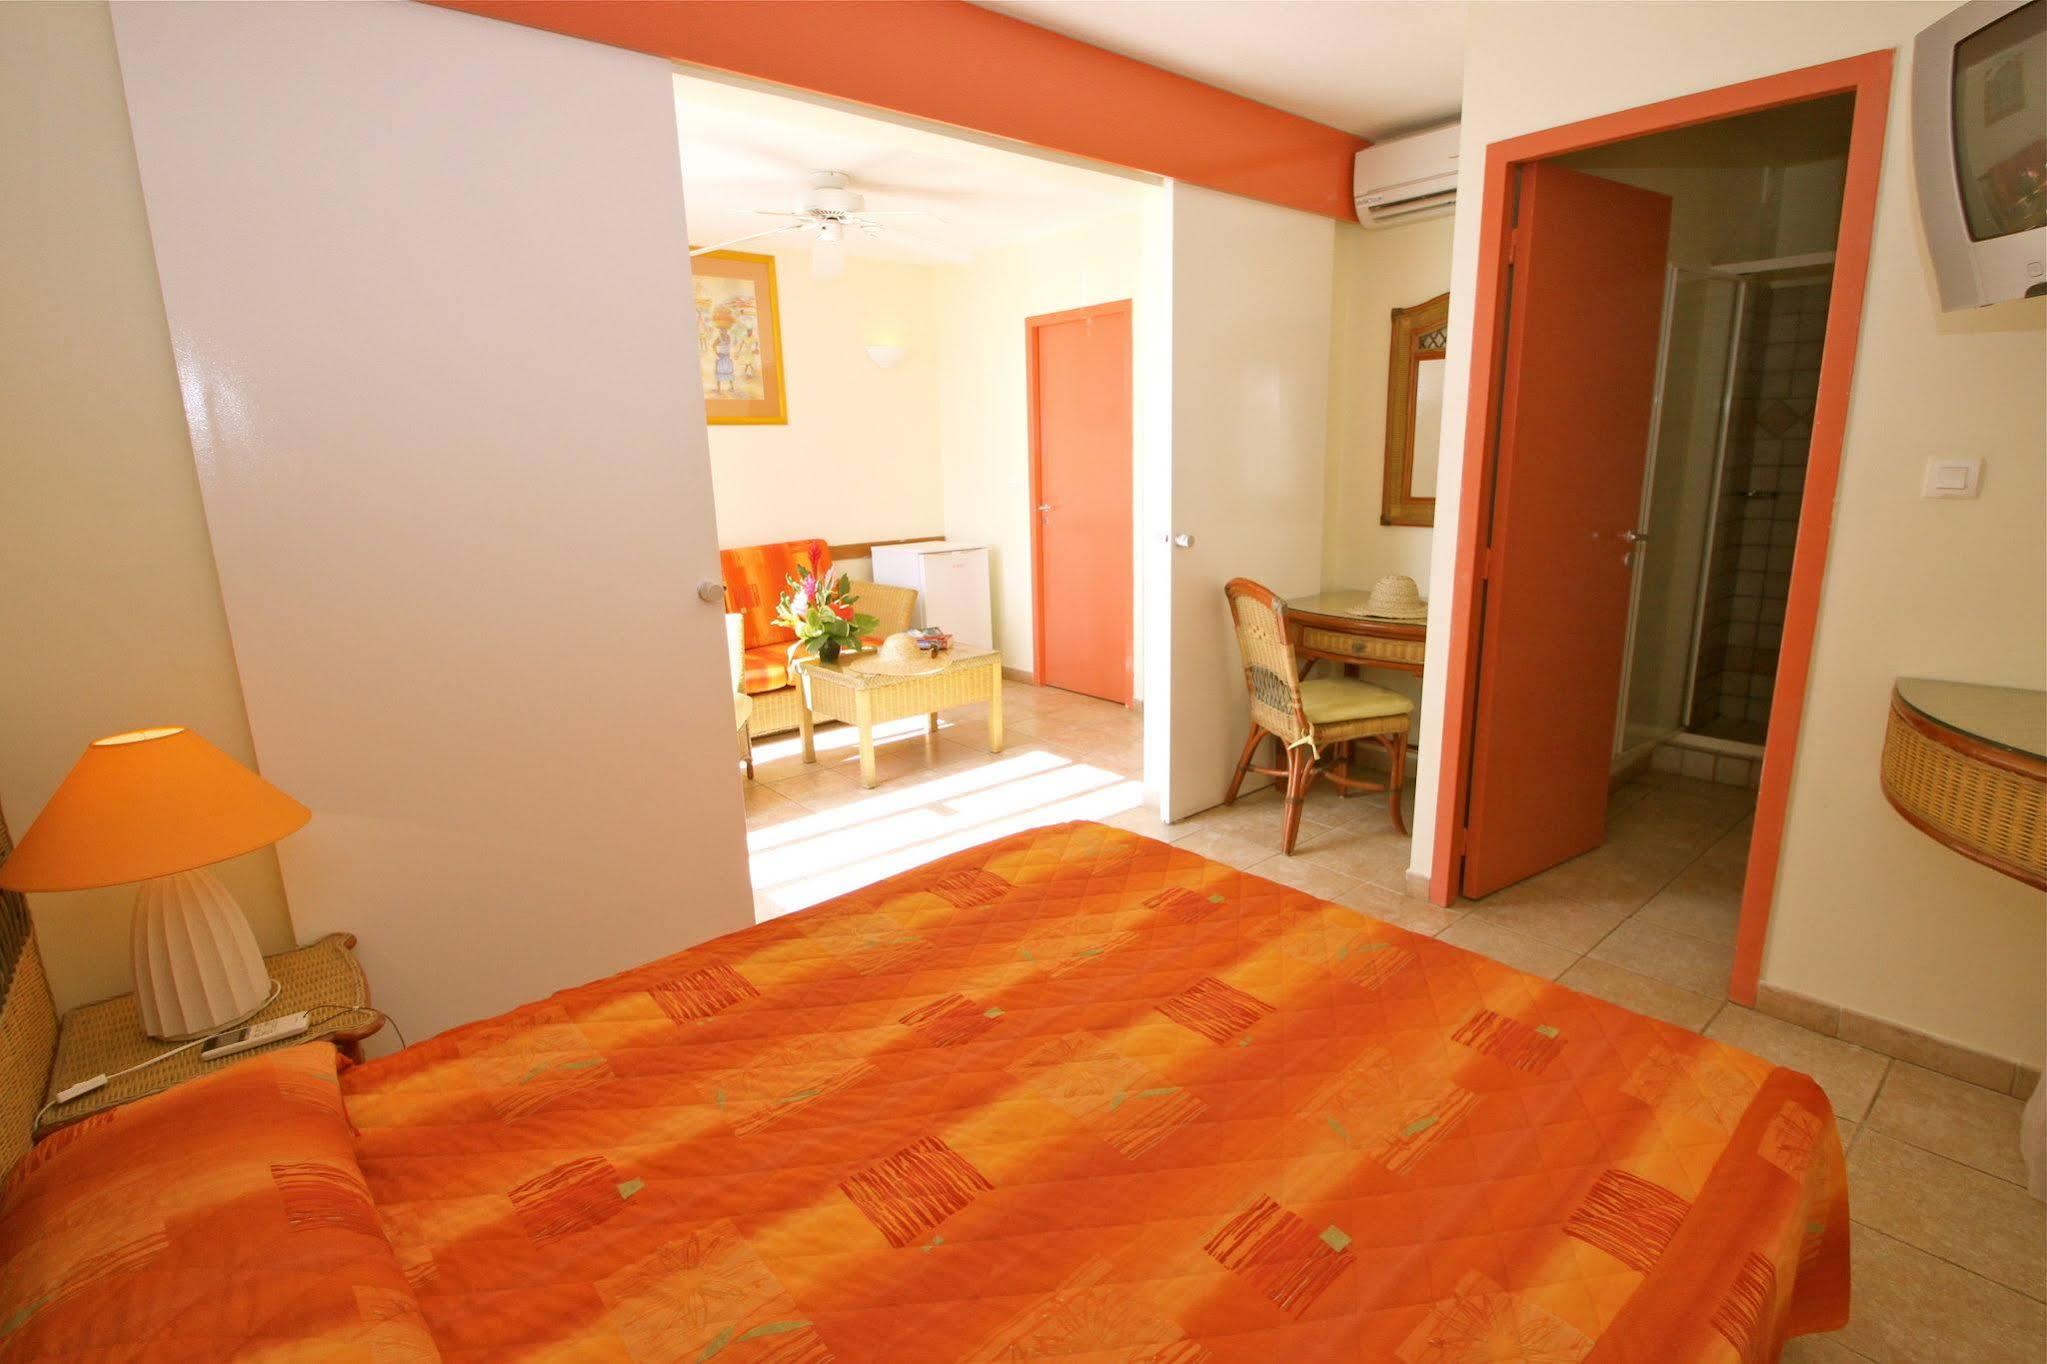 Karibea Resort Sainte Luce - Amyris